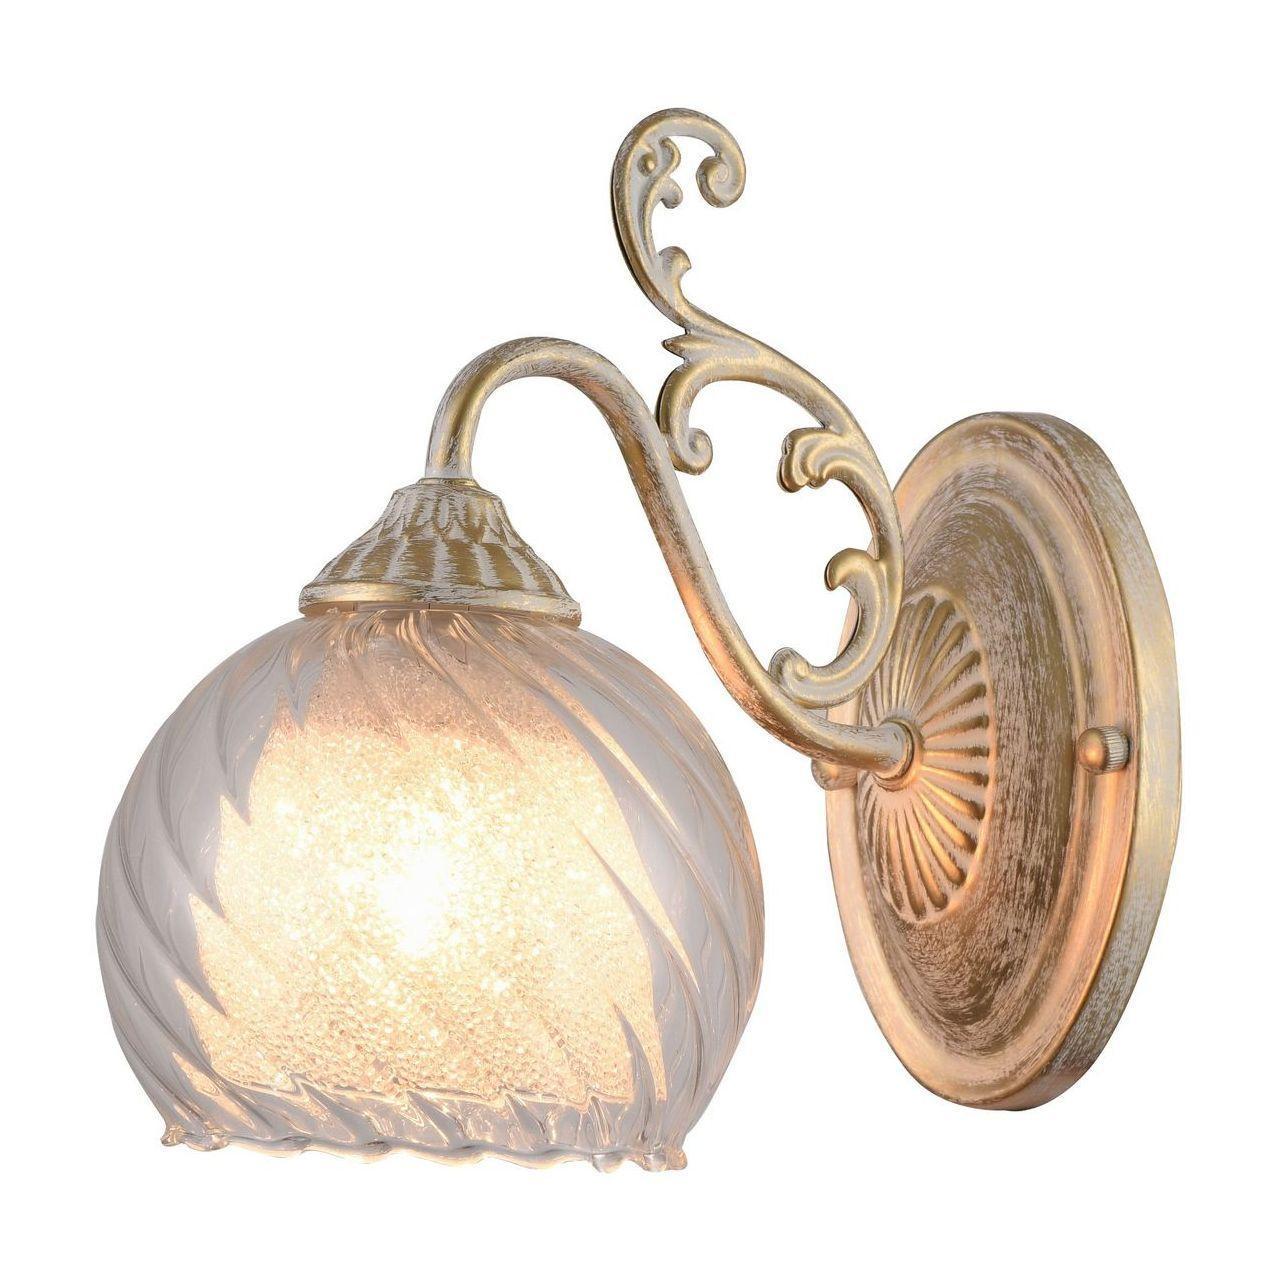 Бра Arte Lamp A7062AP-1WG бра arte lamp 7062 a7062ap 1wg